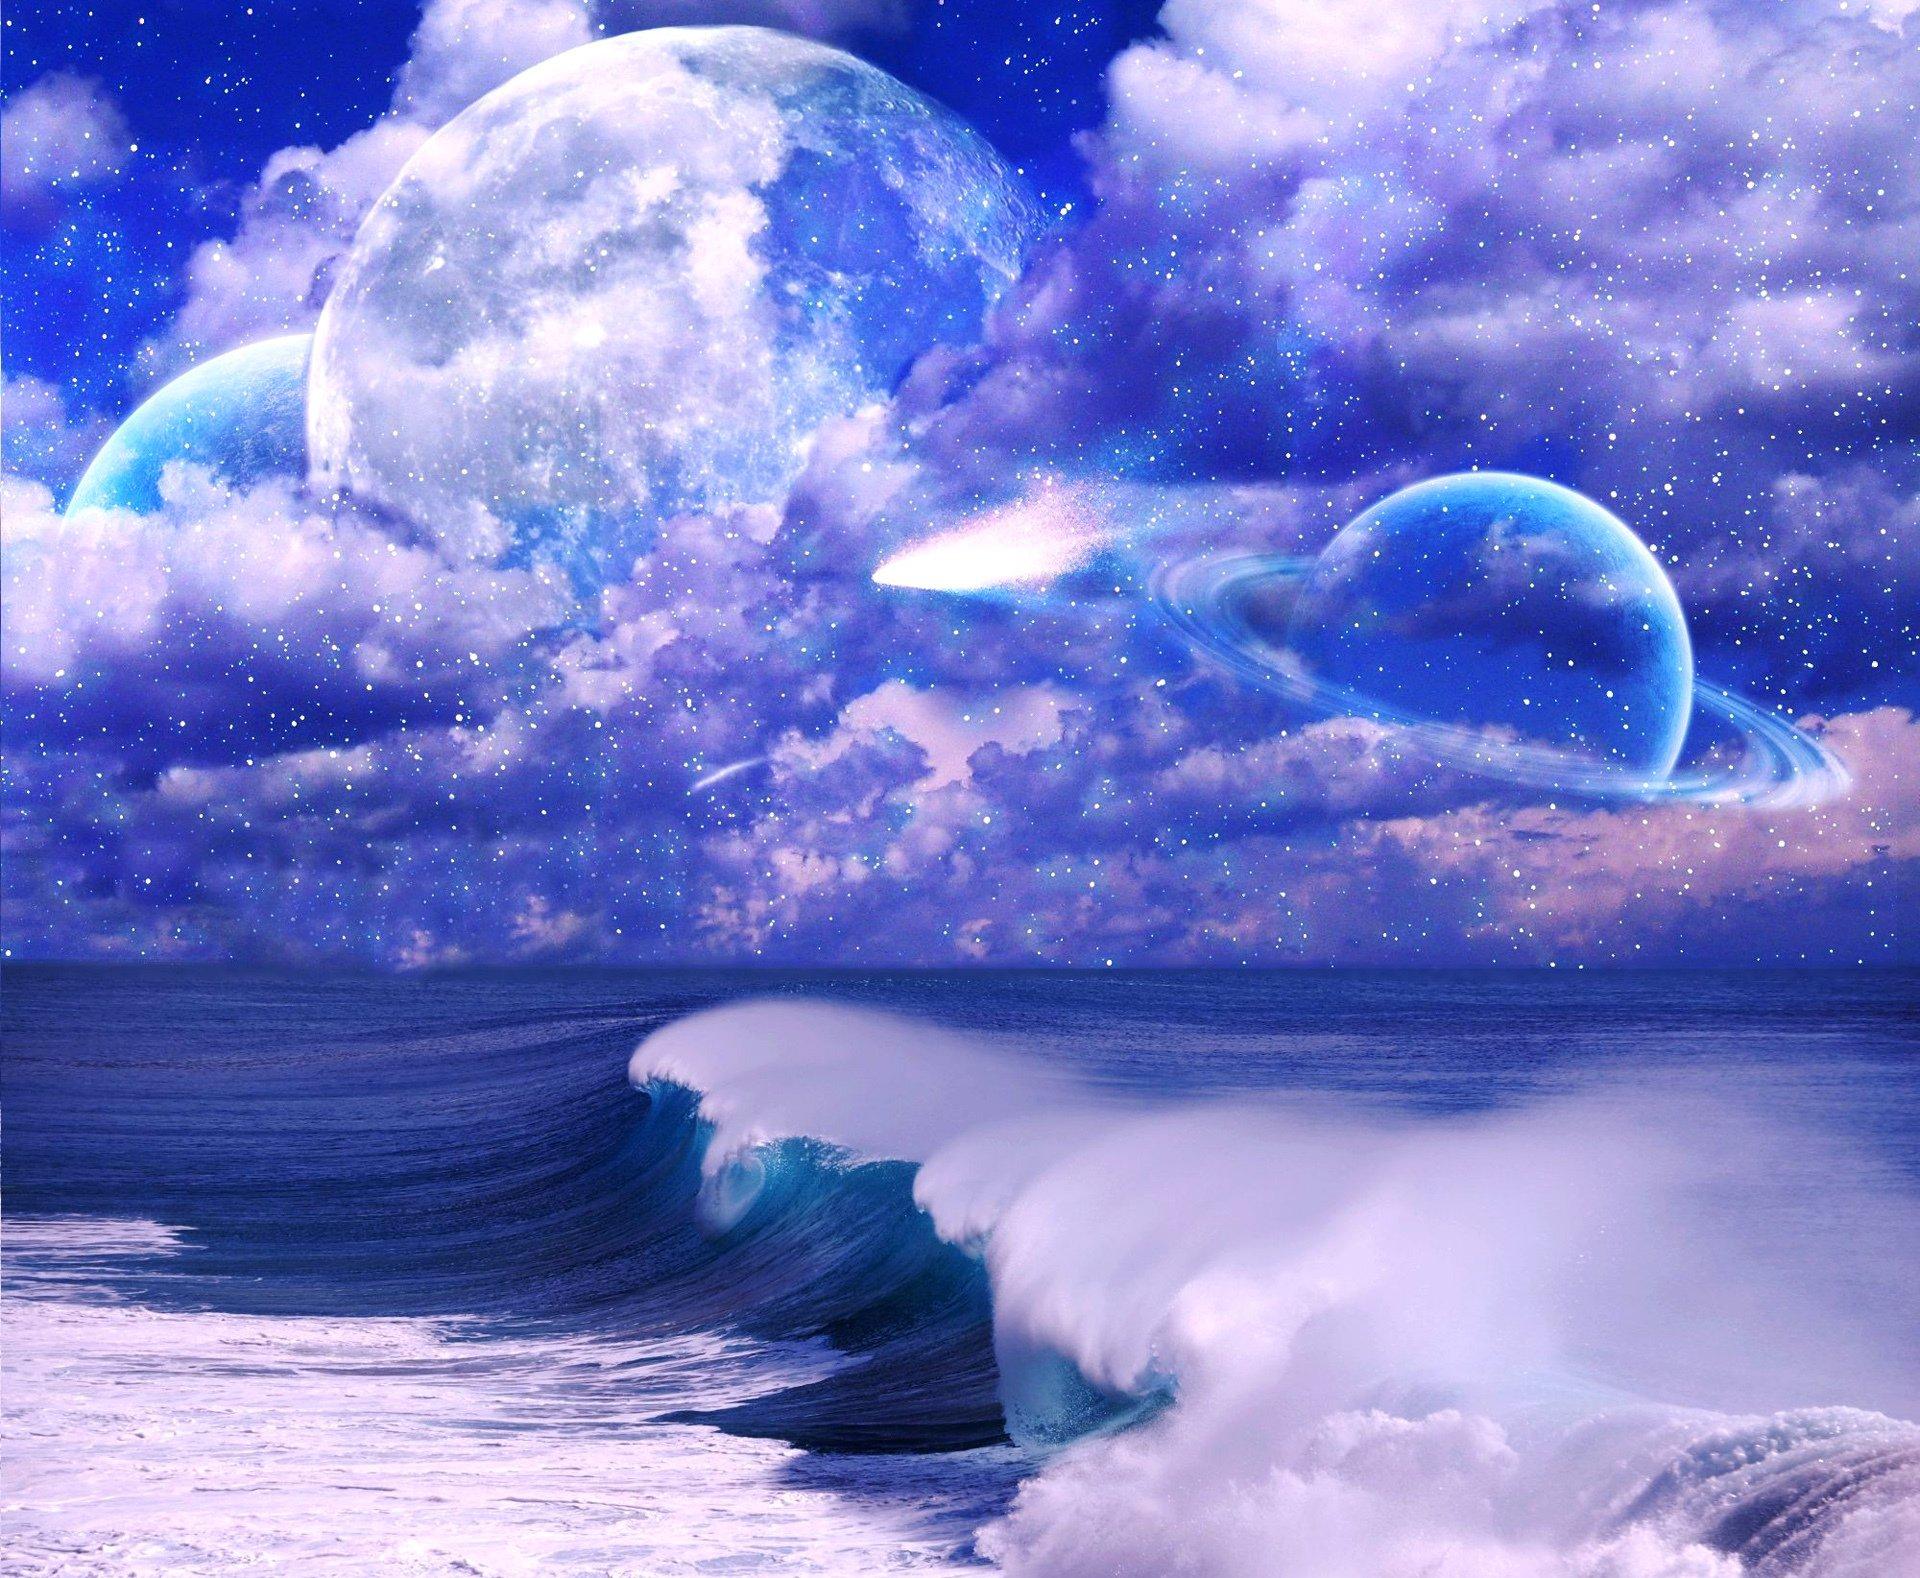 картинки фантастическое небо гиф делом нам